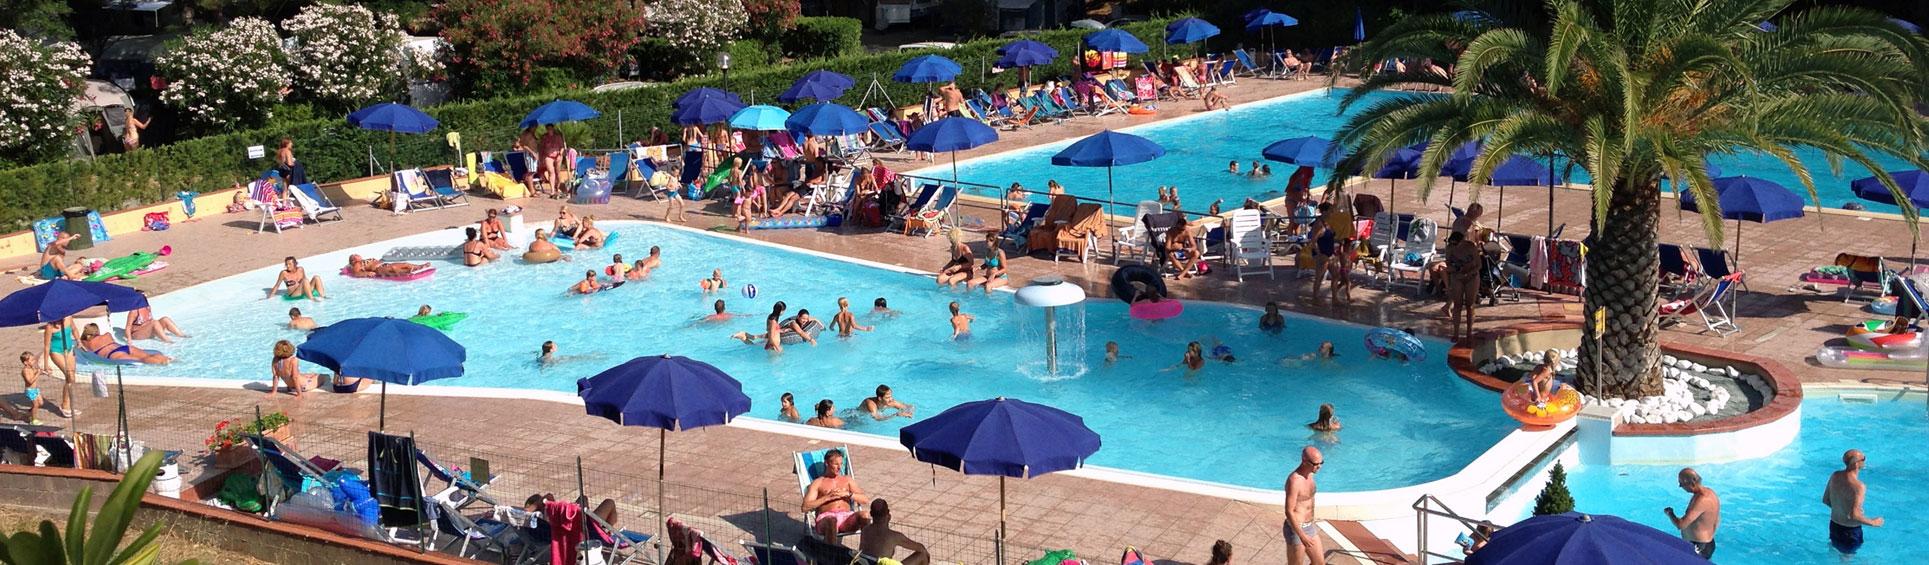 Villaggio vacanze Toscana miniclub